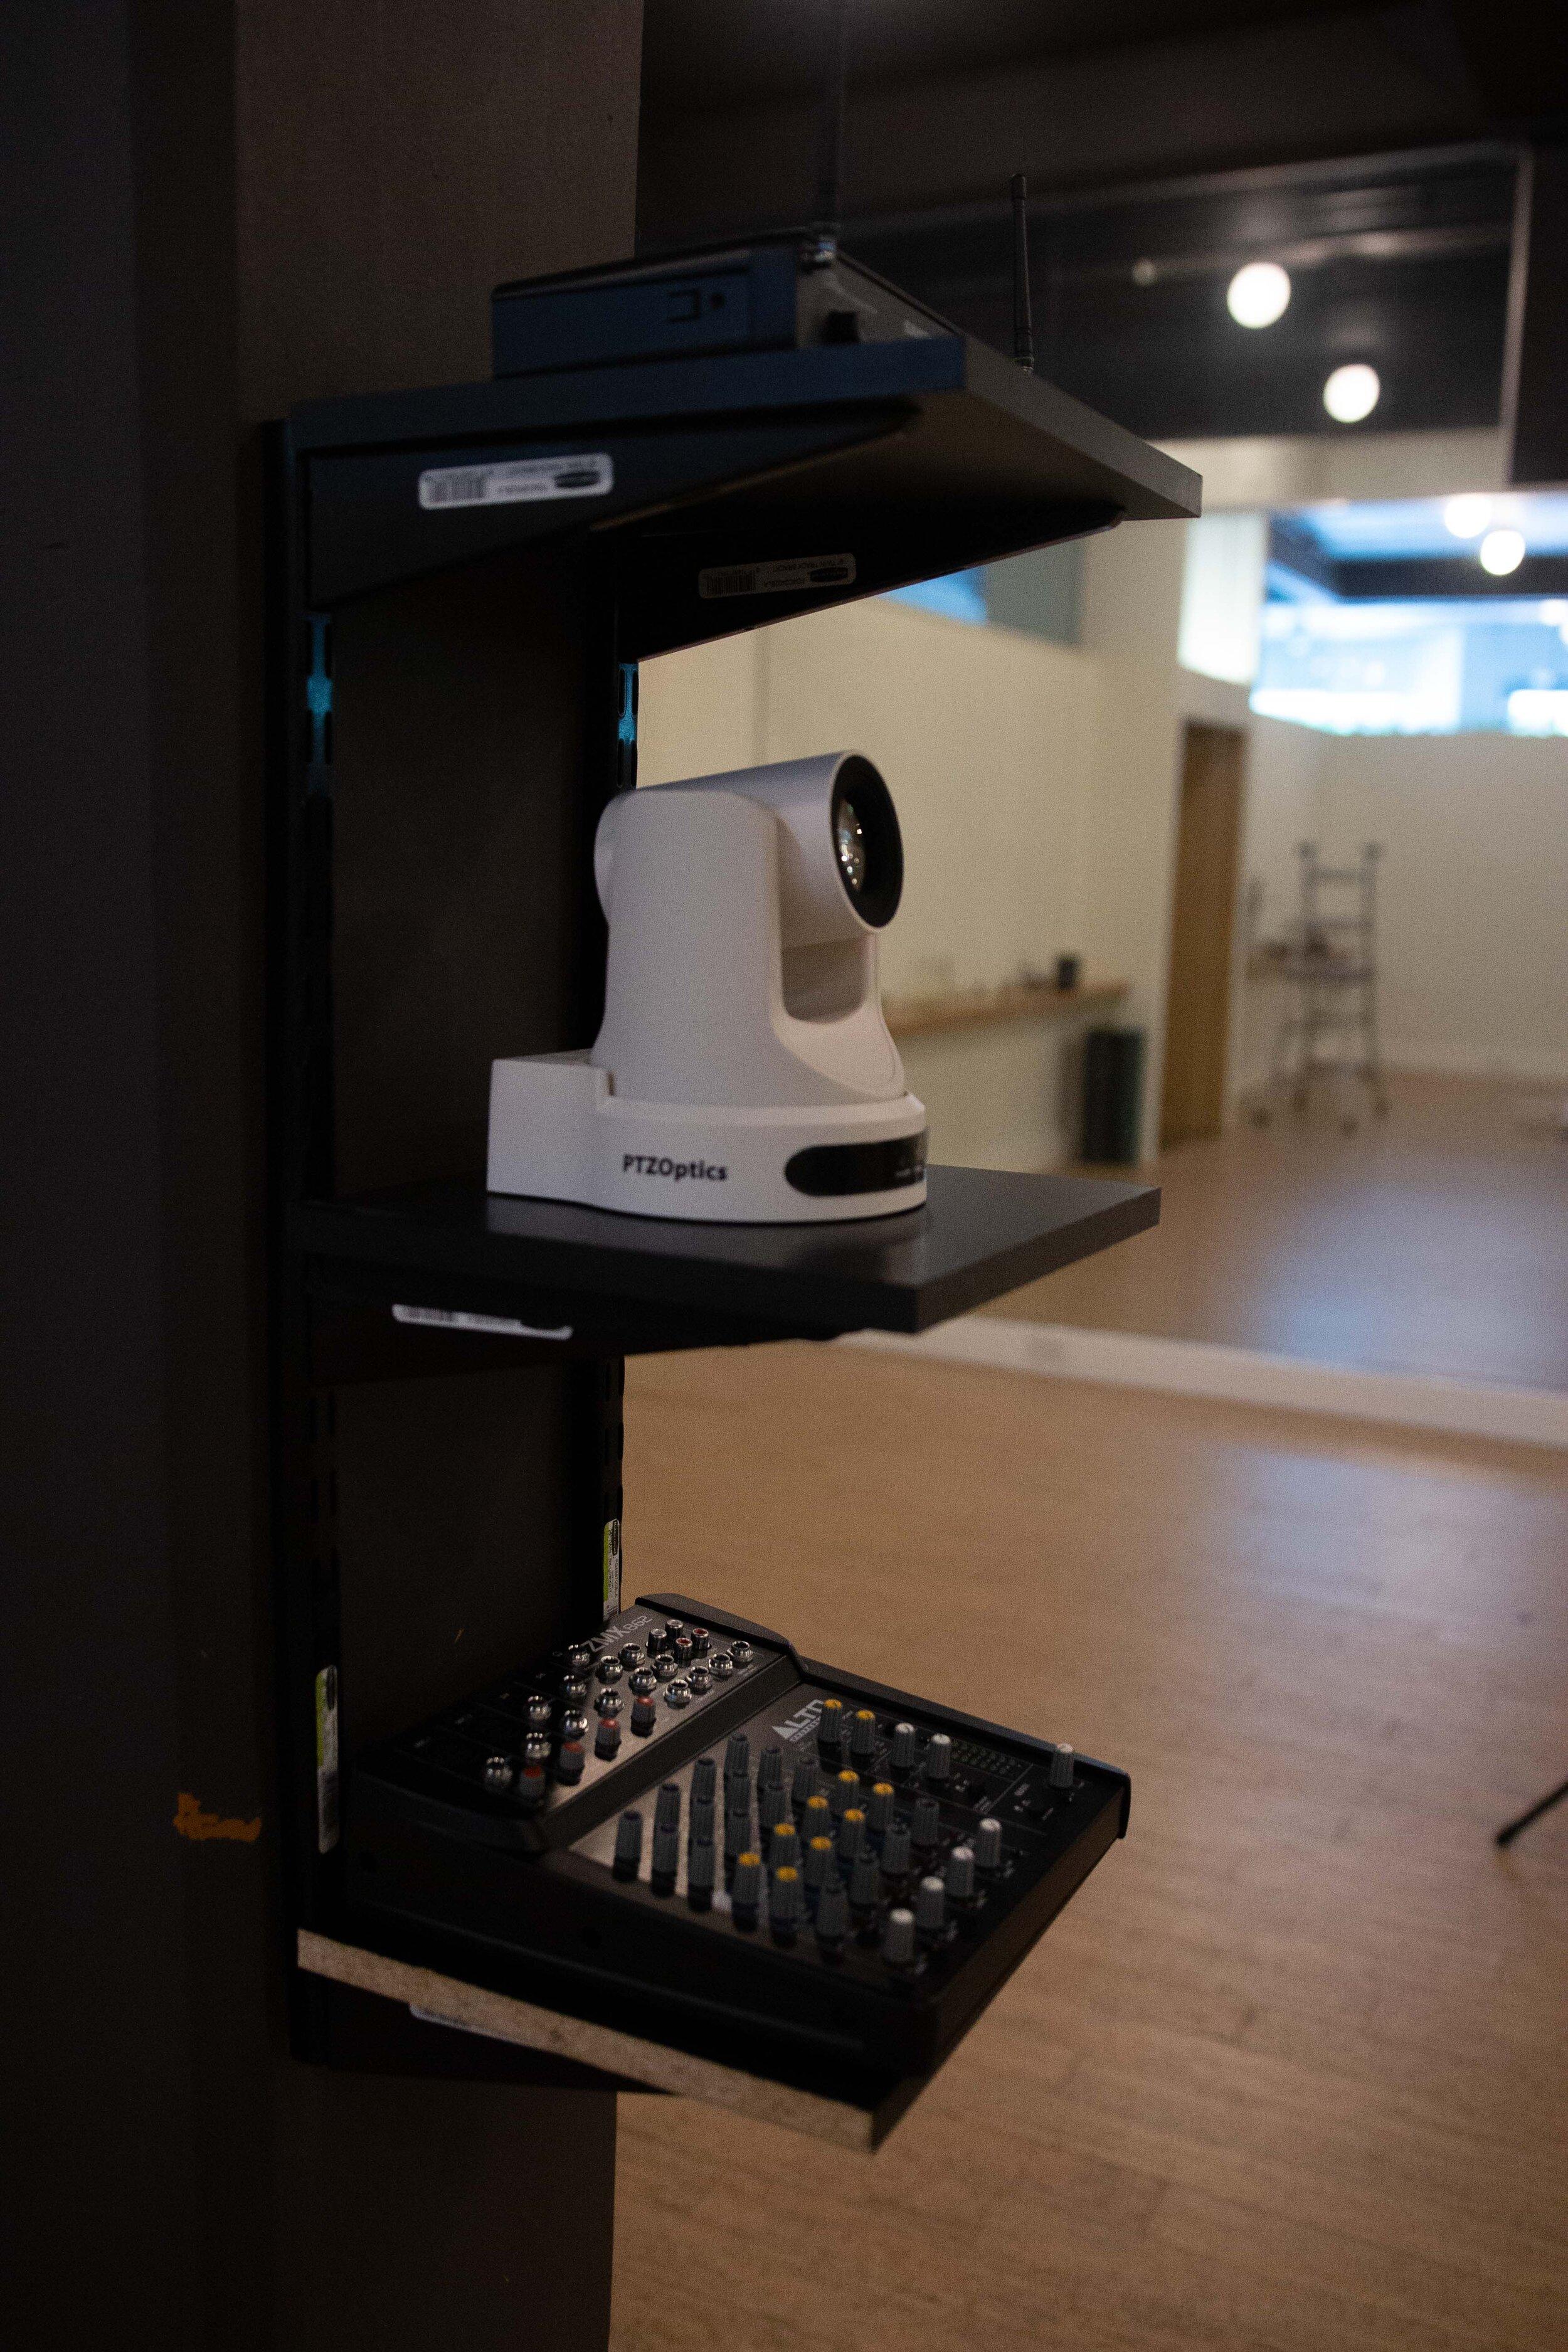 The live-streaming production enclosure at BFREE Yoga.